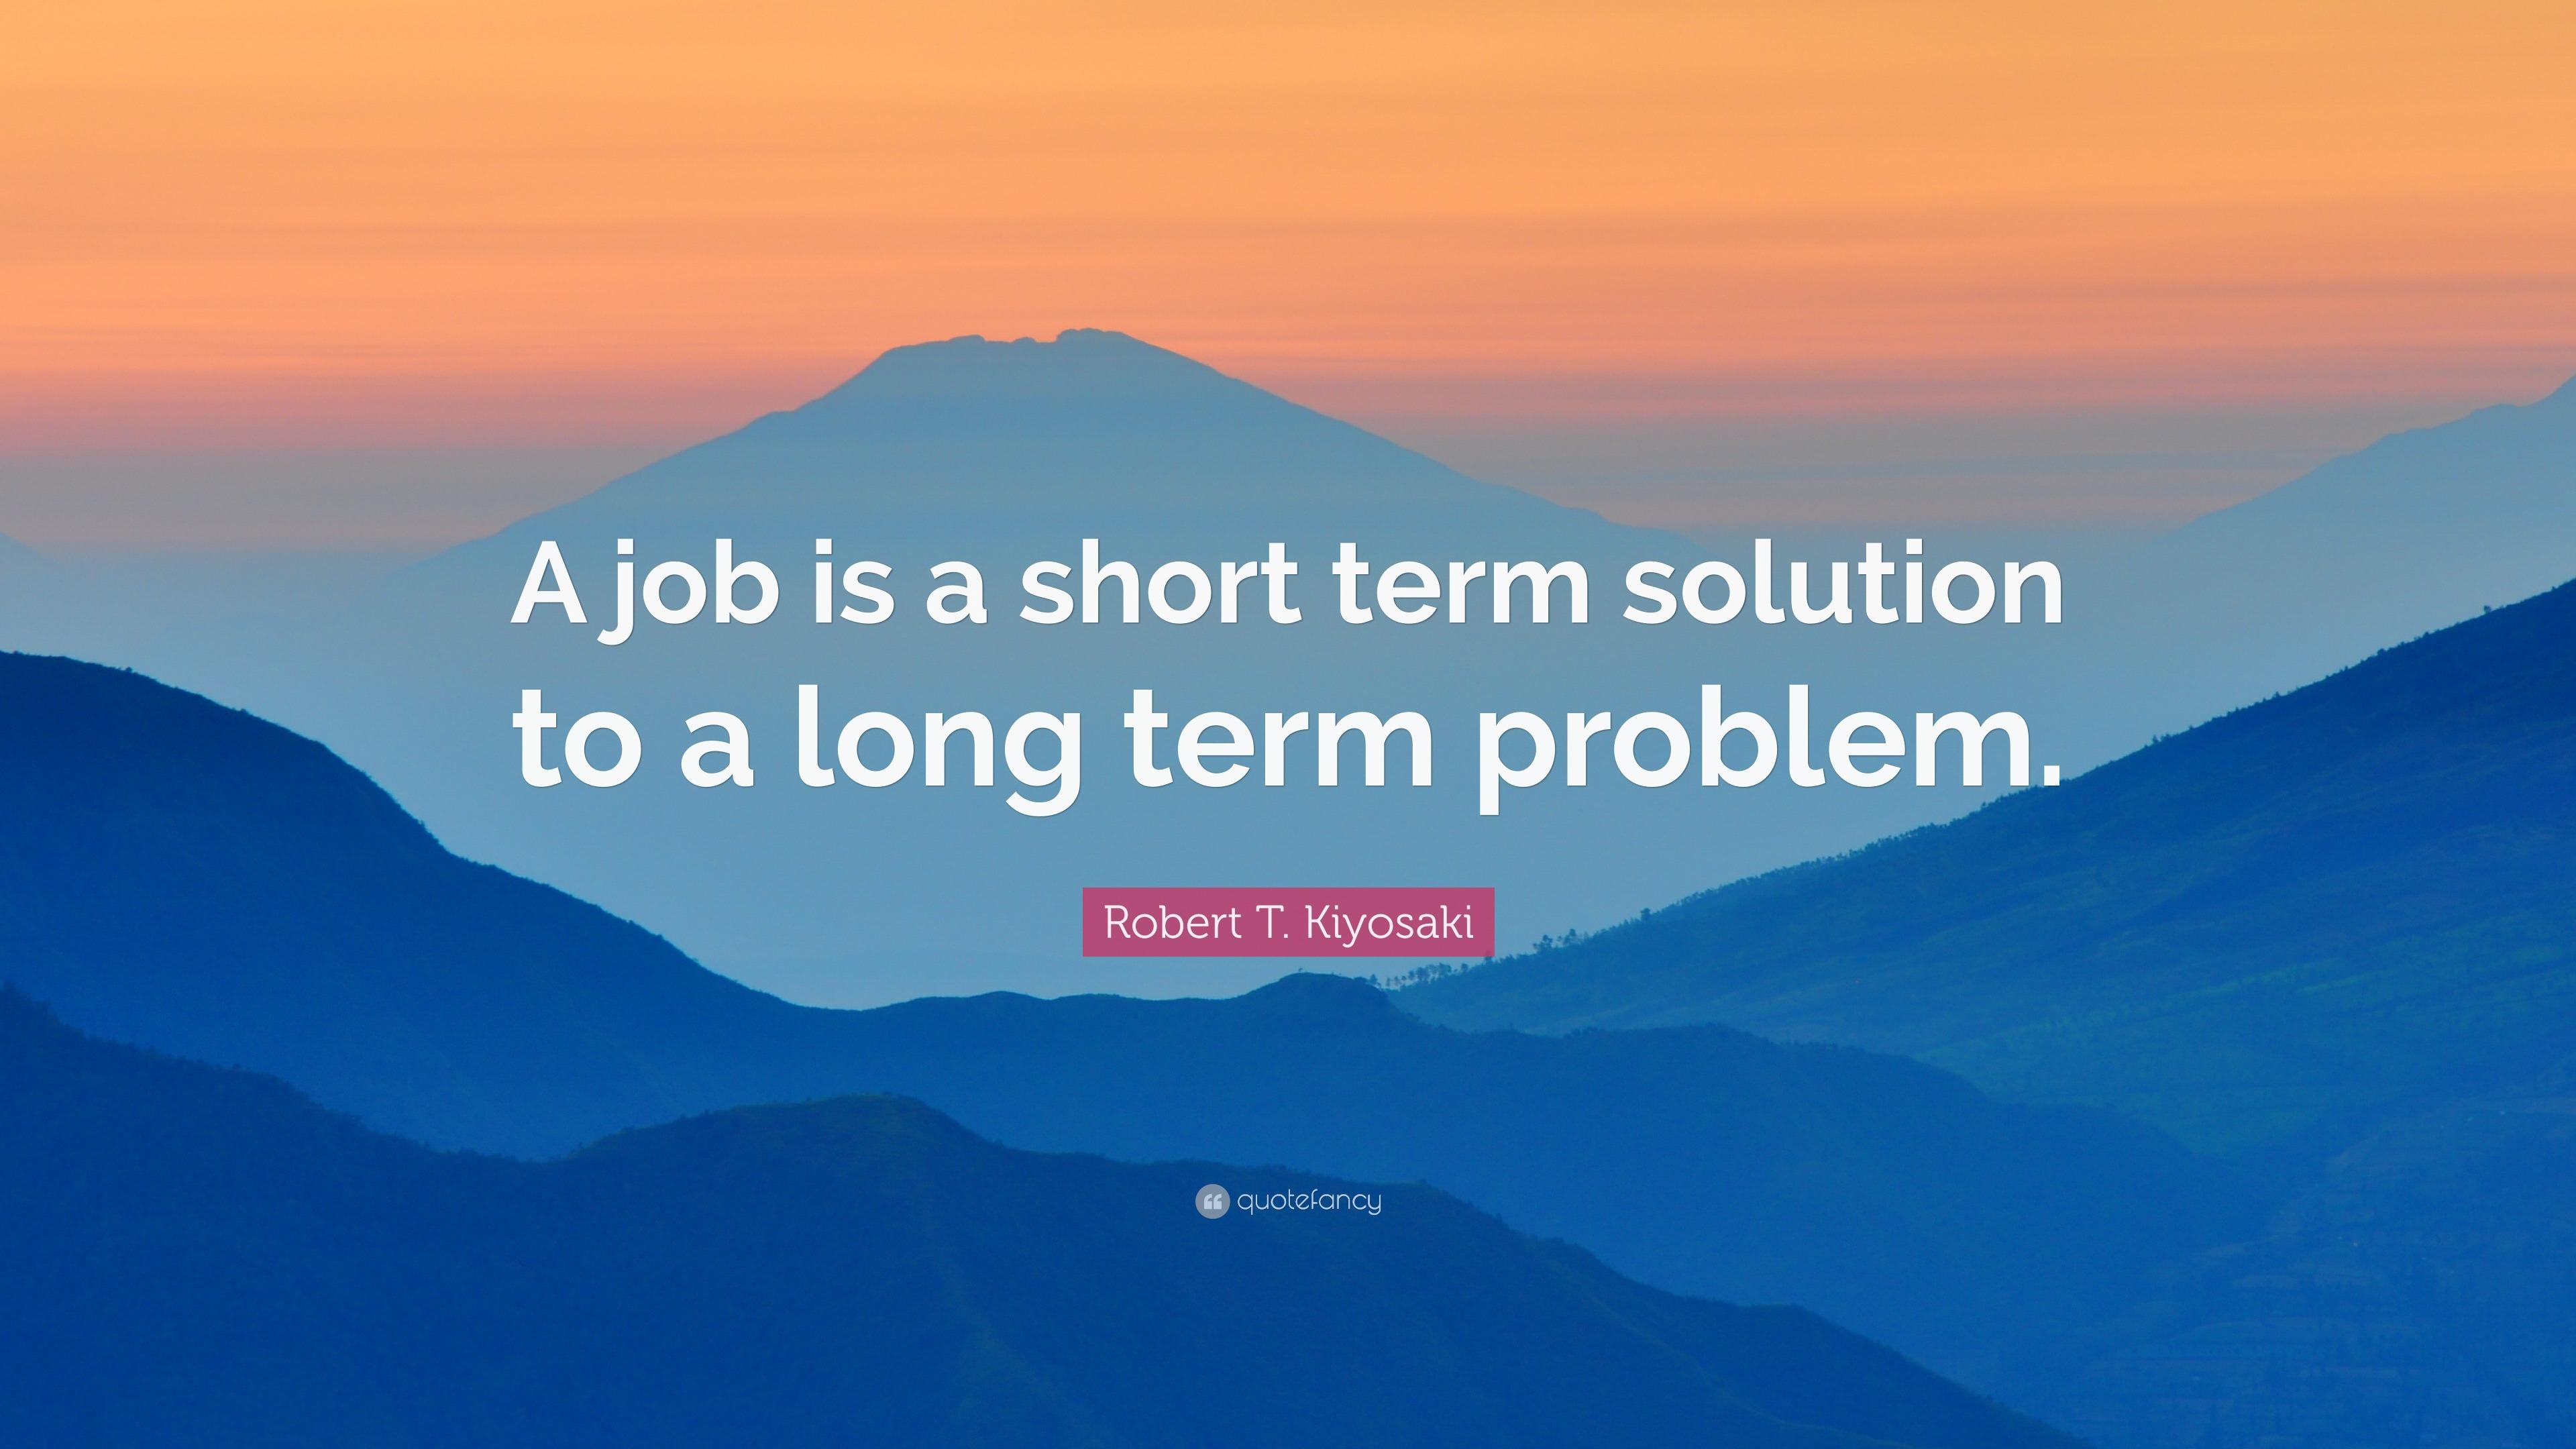 Elon Musk Quotes Wallpaper Robert T Kiyosaki Quote A Job Is A Short Term Solution